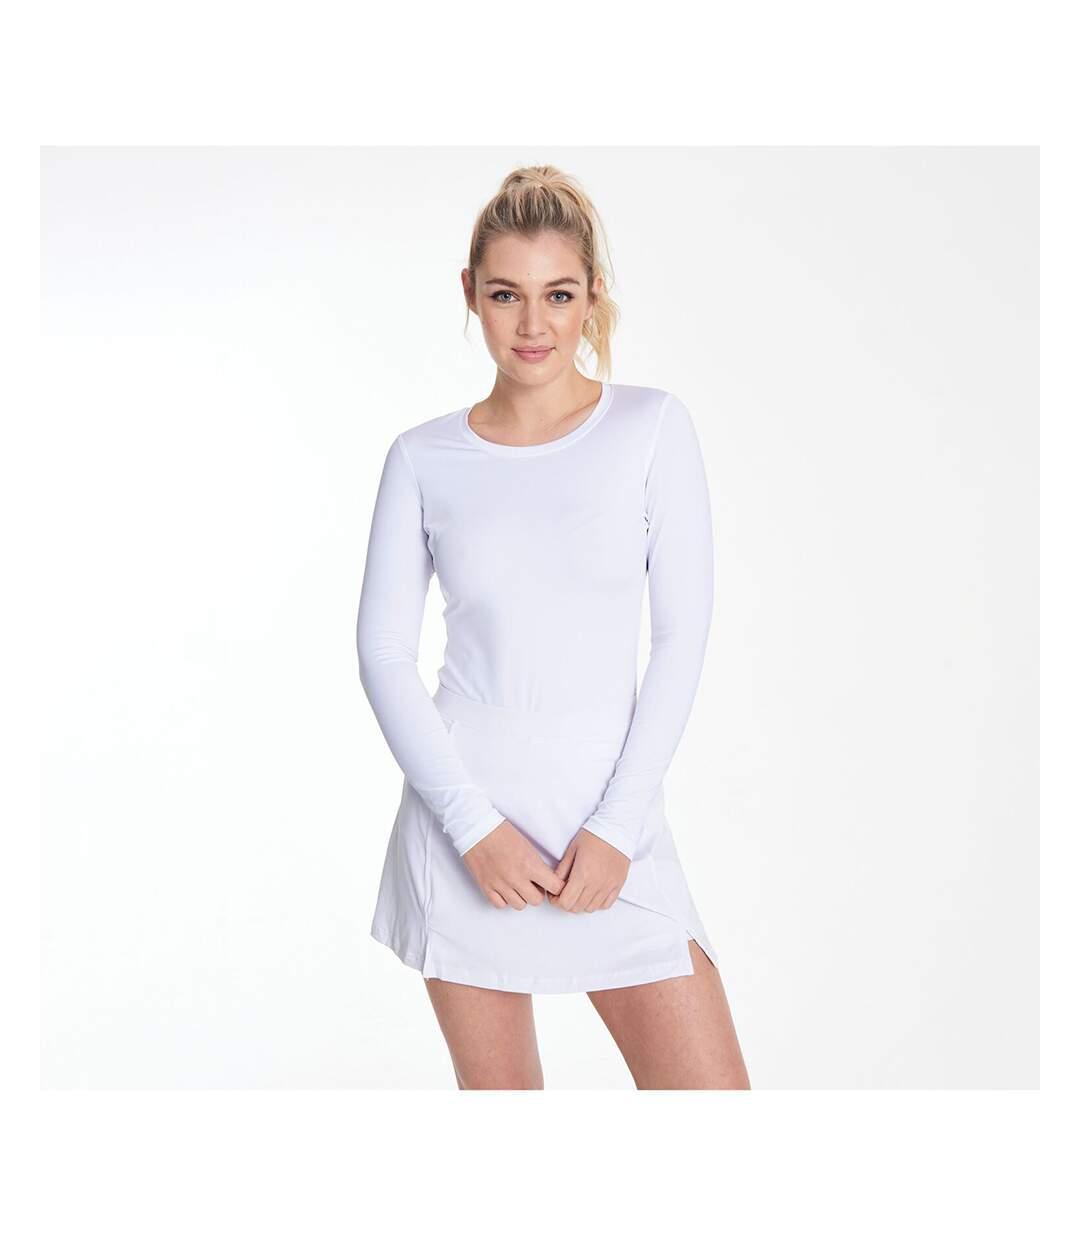 Rhino - T-Shirt Base Layer À Manches Longues - Femme (Blanc) - UTRW2829